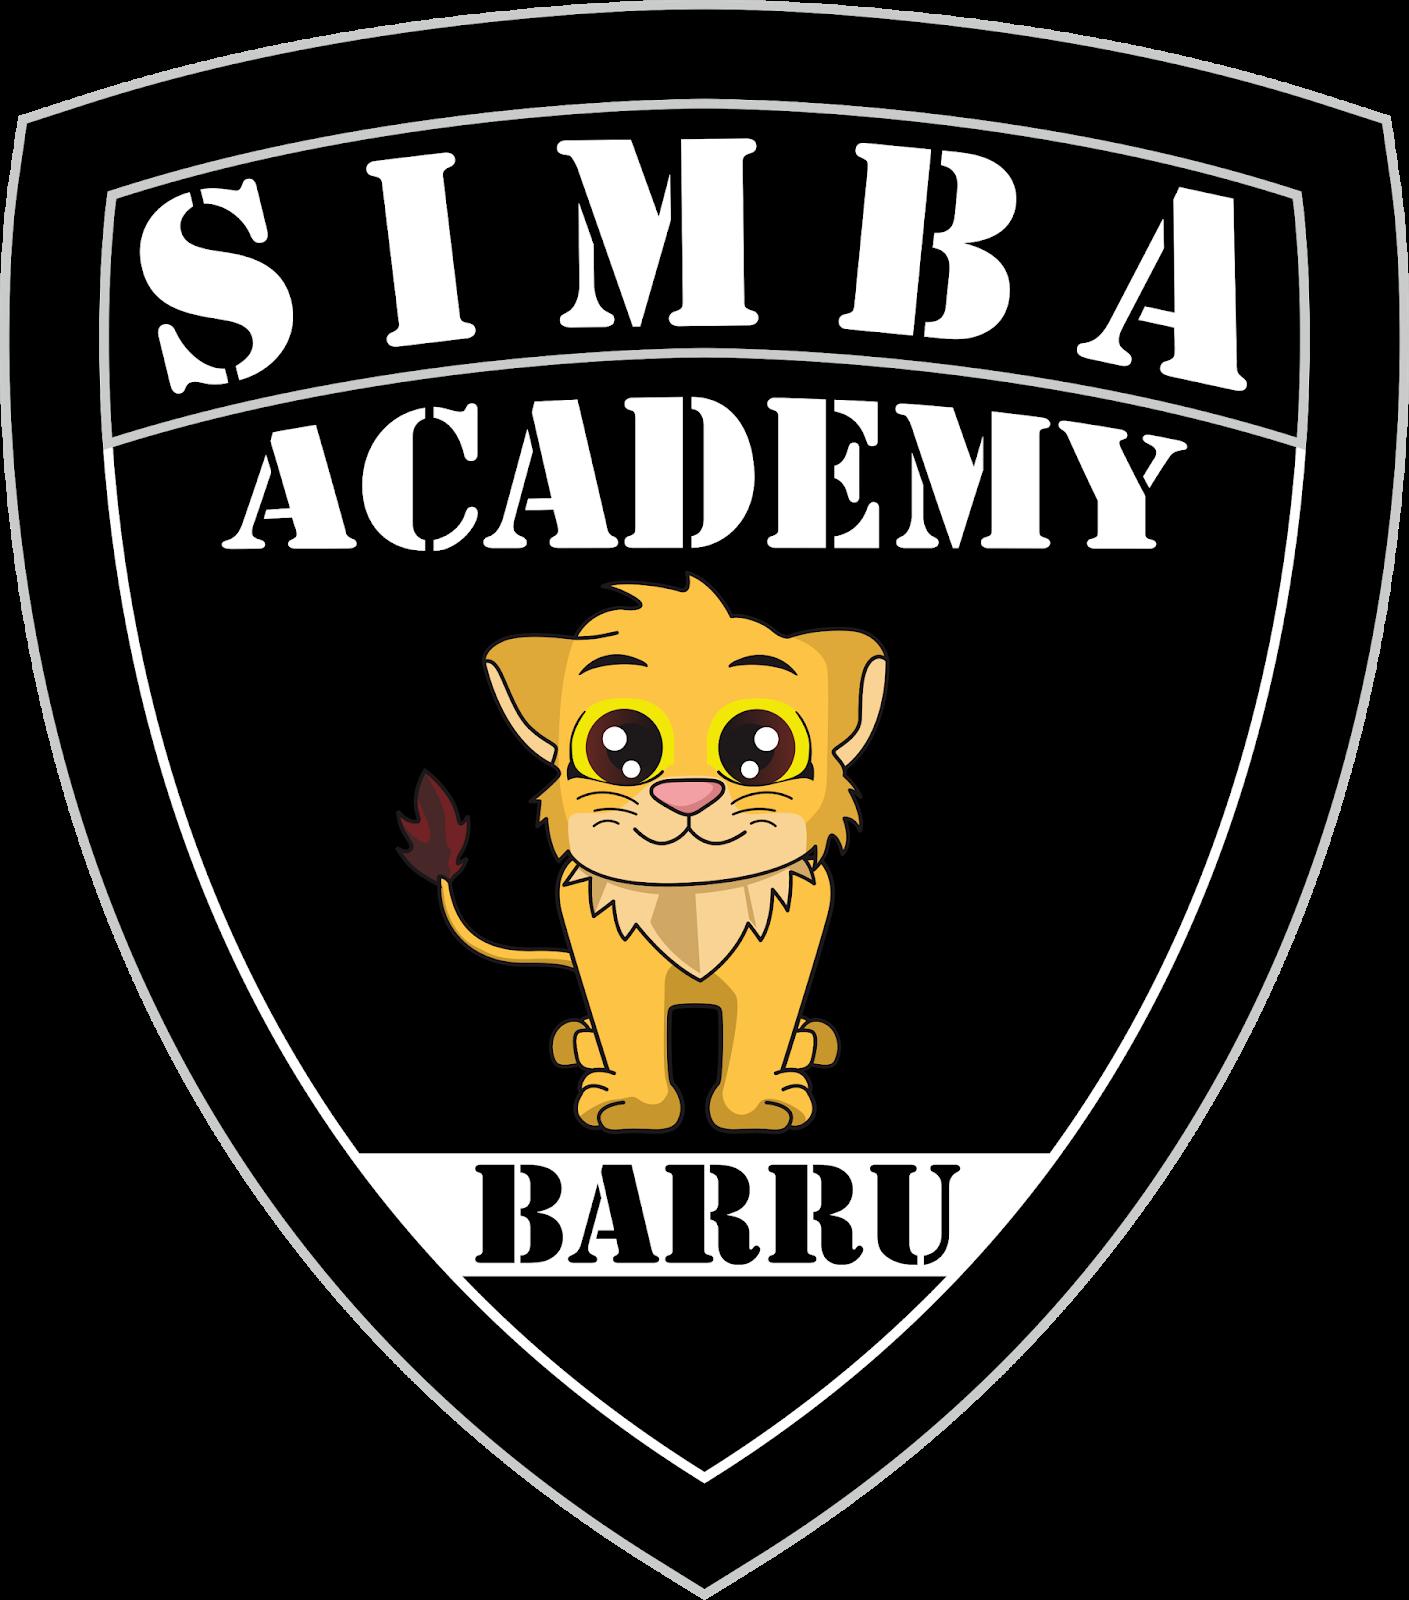 Logo Baznas Kabupaten Barru Logo Layanan Aktif Baznas Barru Dan Logo Simba Academy Baznas Barru Baznas Kabupaten Barru